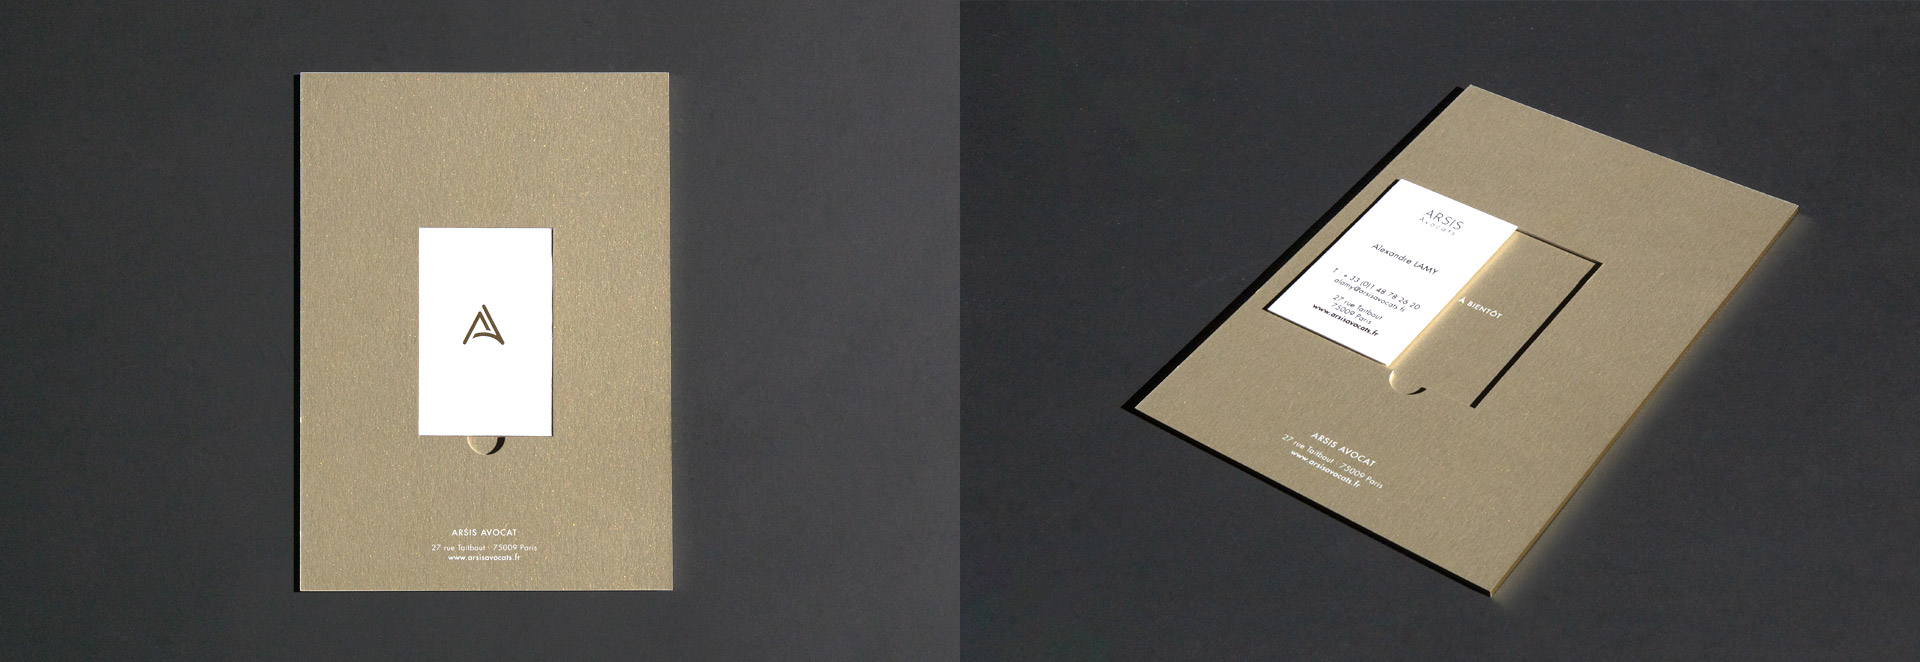 Epok design-carte de voeux-2020-art deco-dos-decoupe